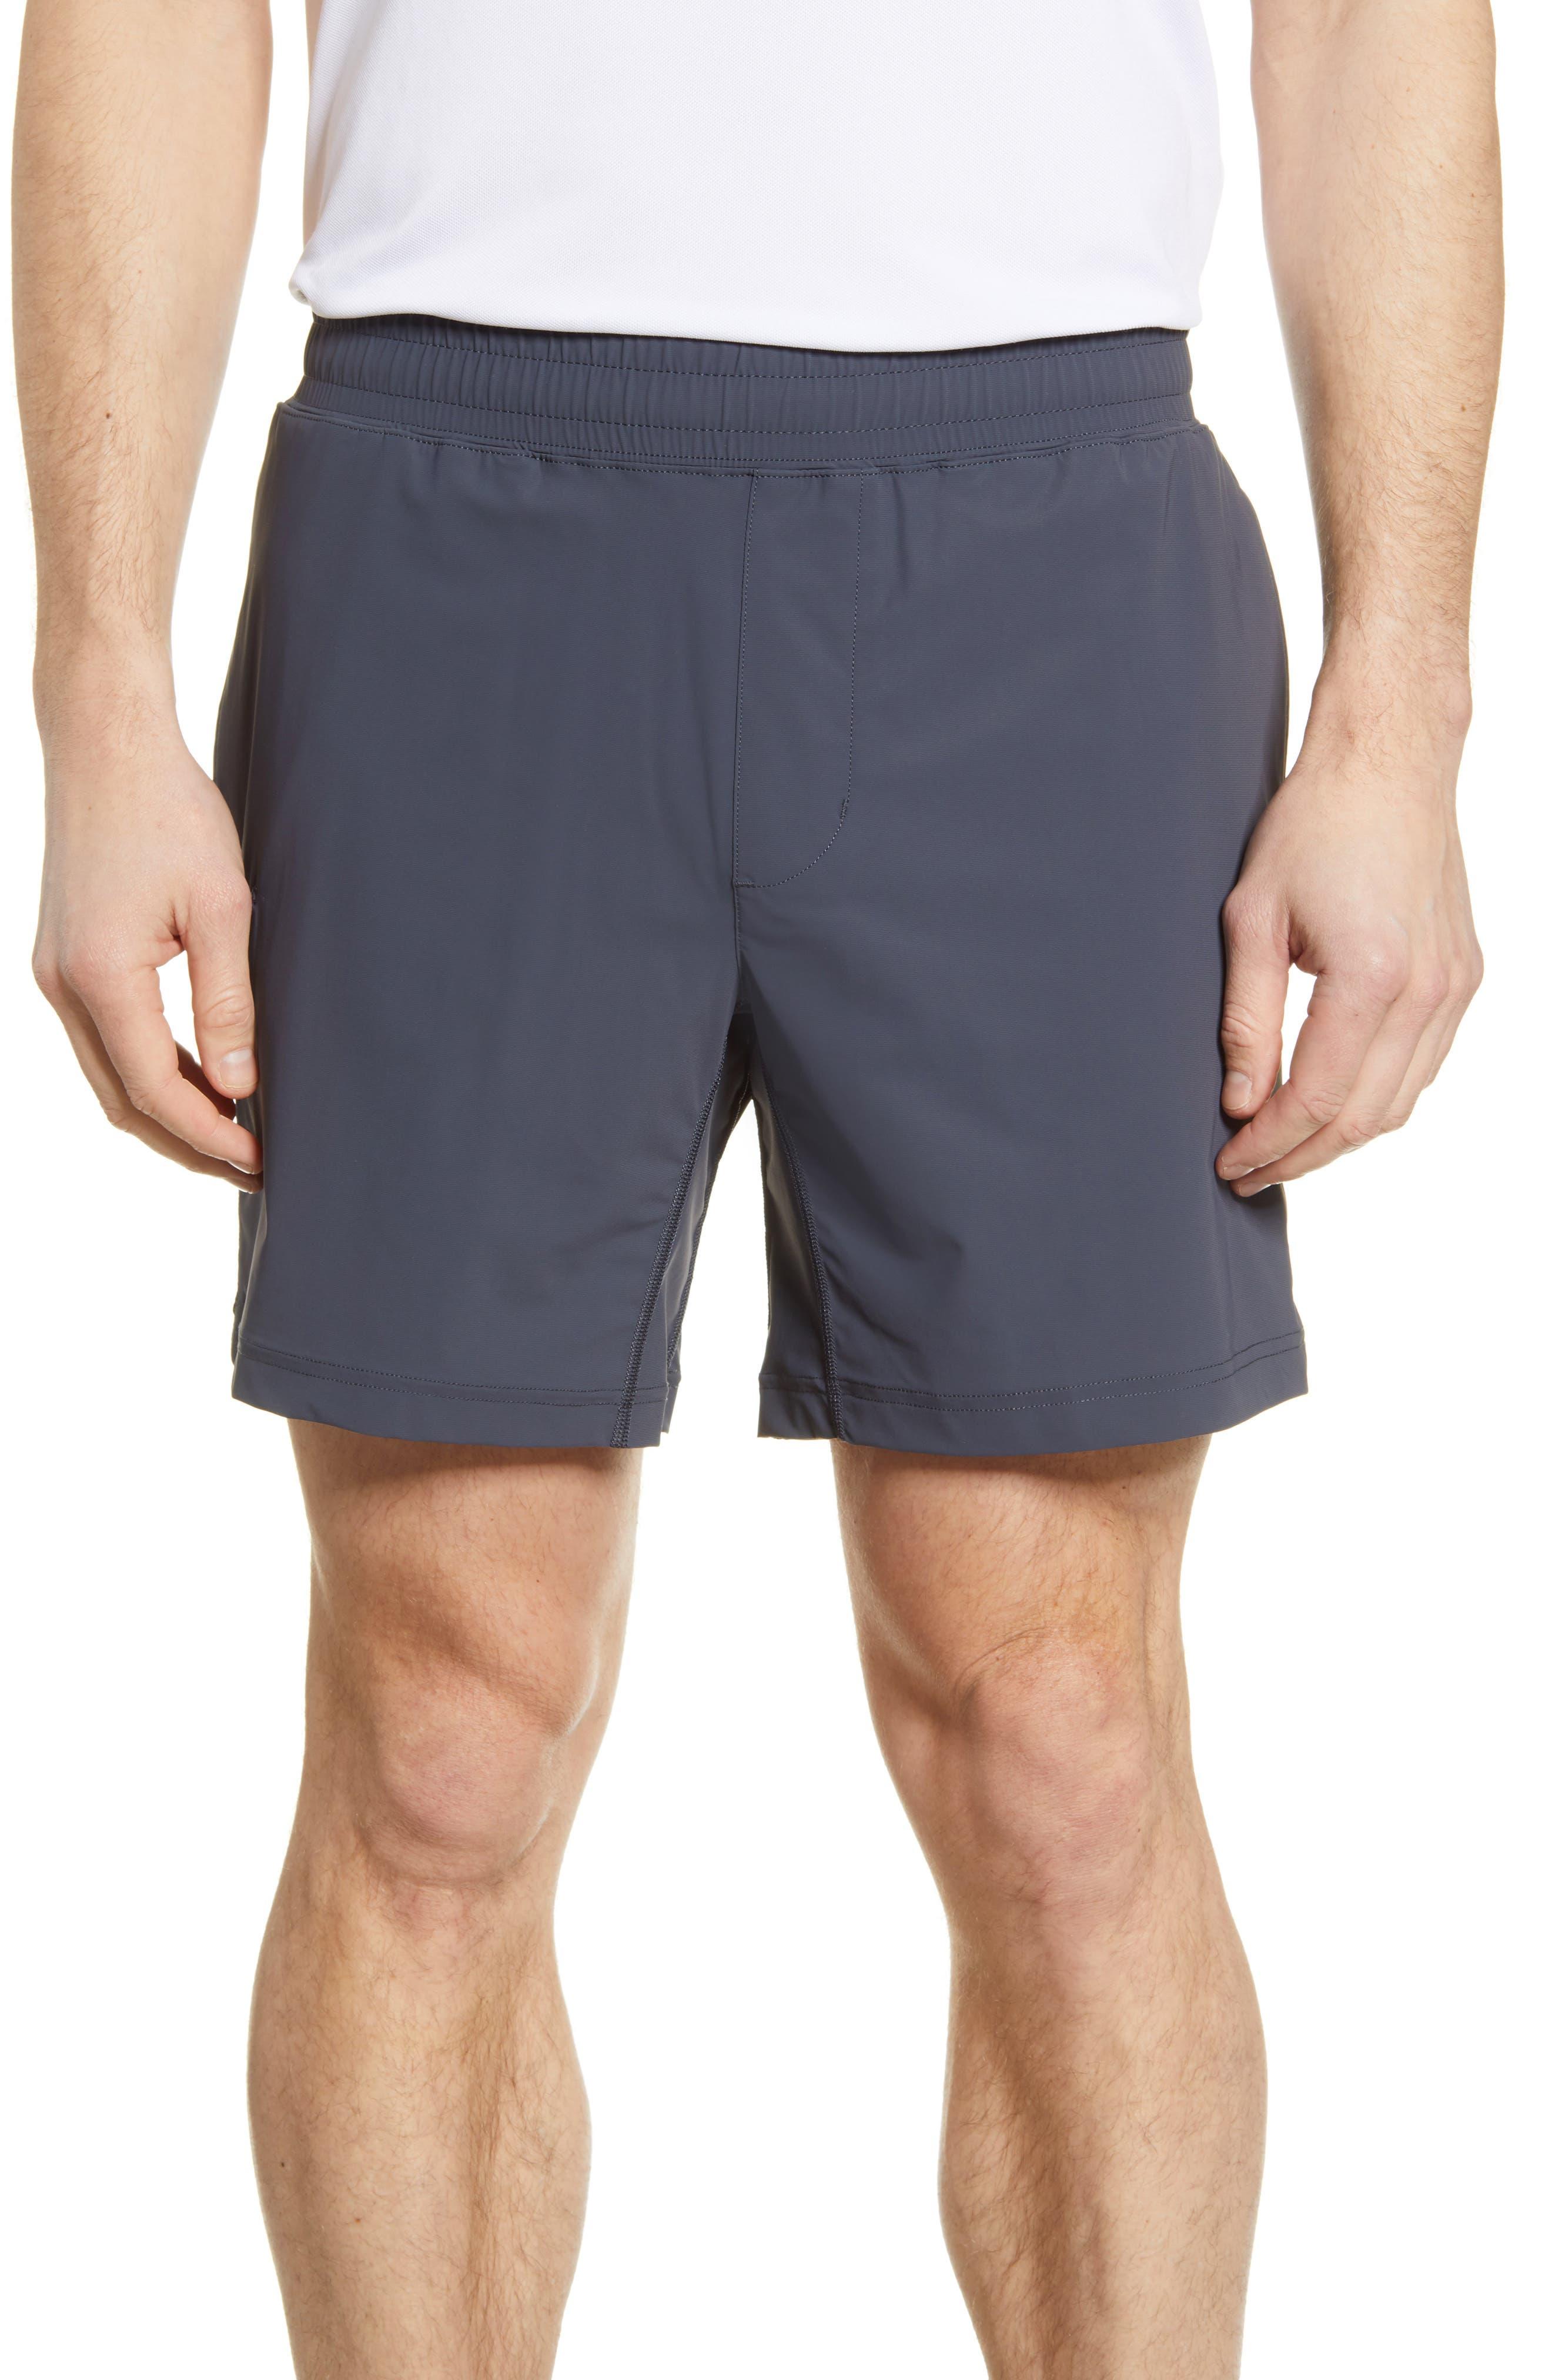 Men's Rhone Versatility Performance Athletic Shorts,  Medium - Grey